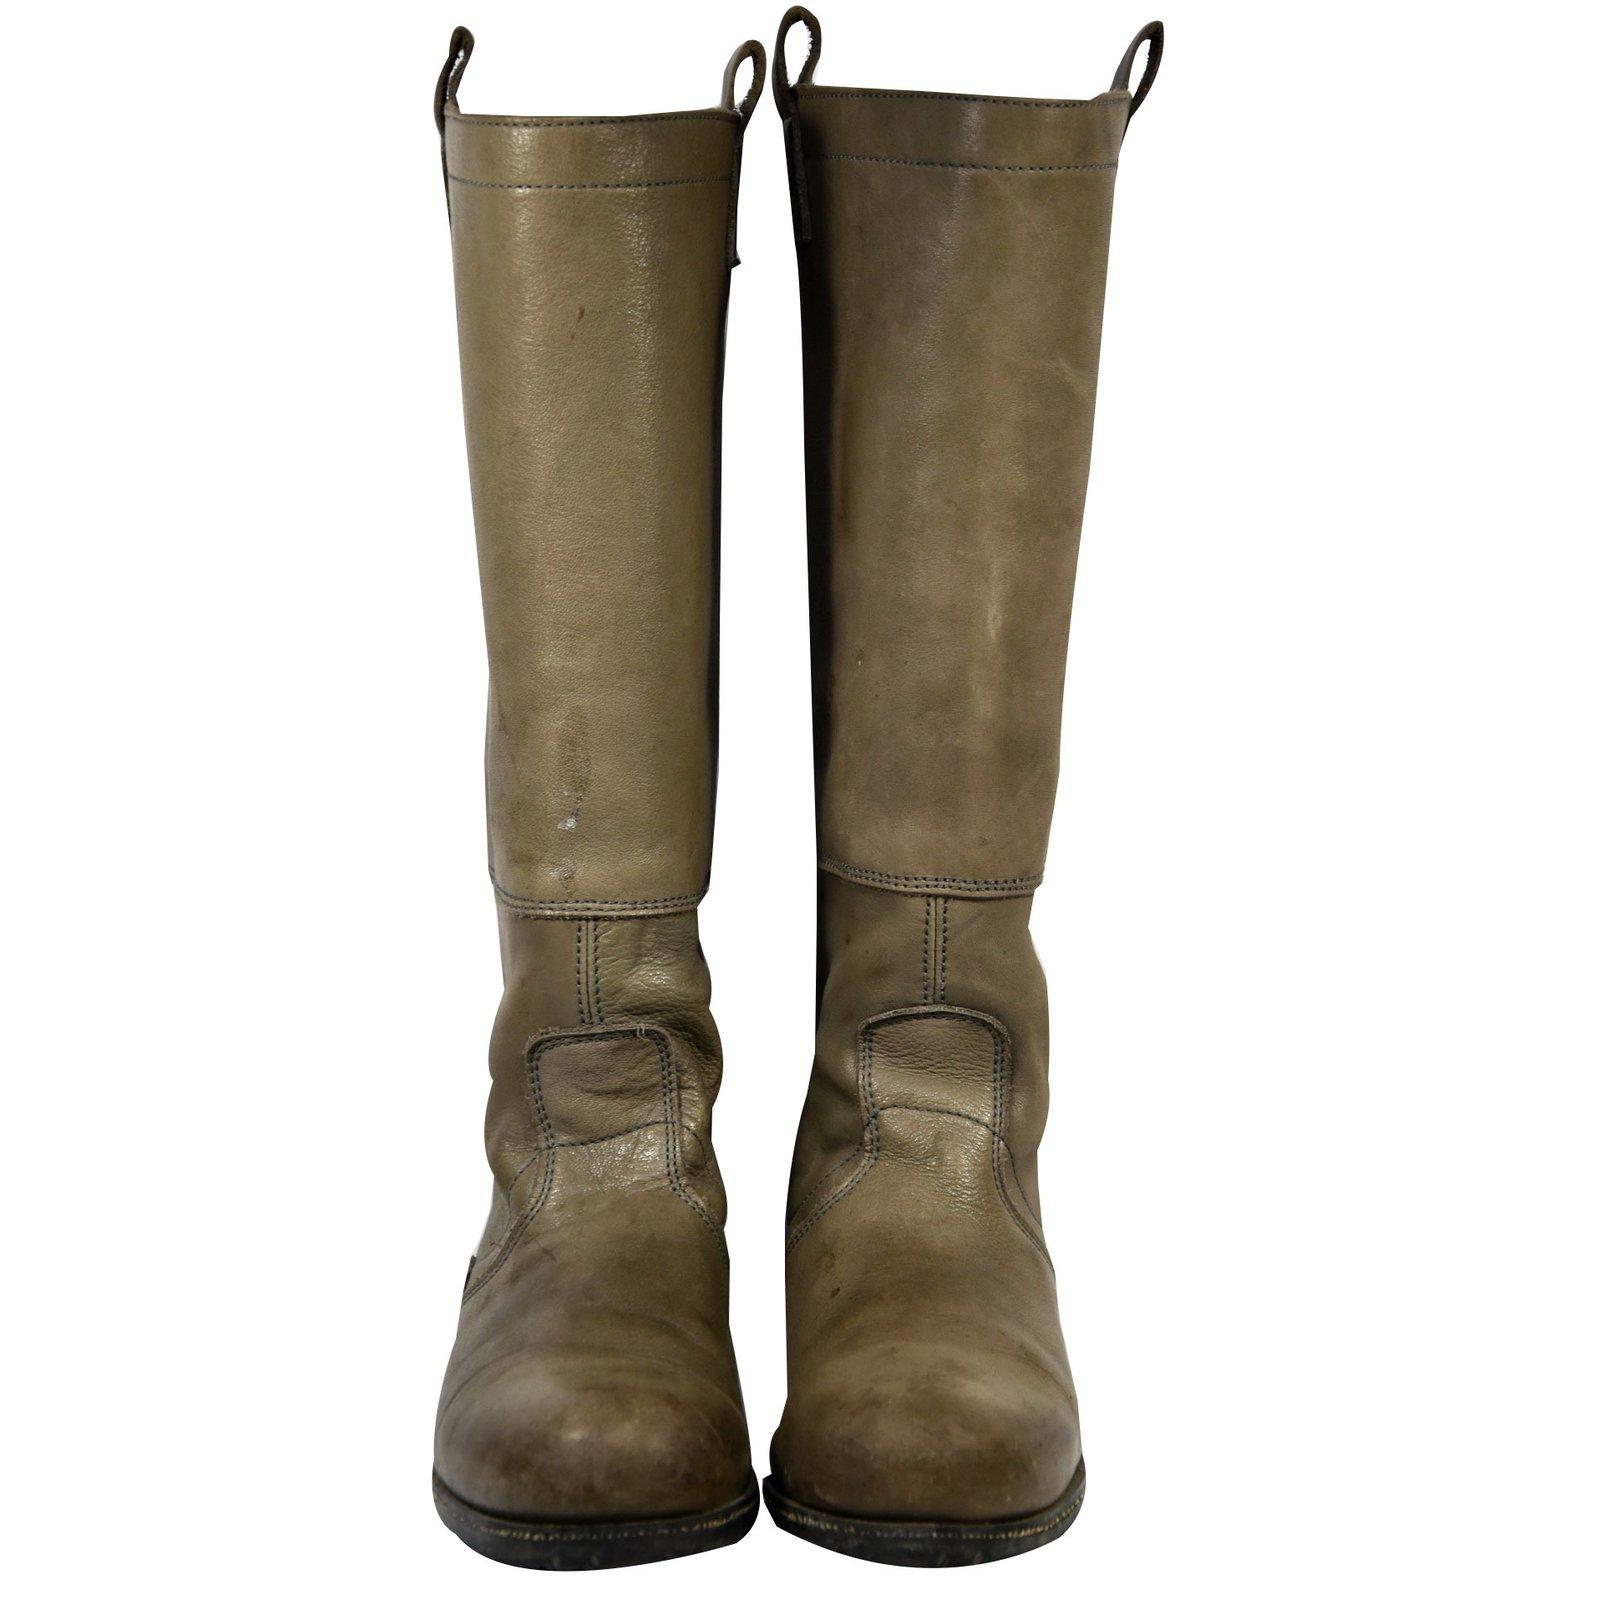 Joli Boots Boots Palladium Leather Brown Closet ref 46452 Yf76vbgy